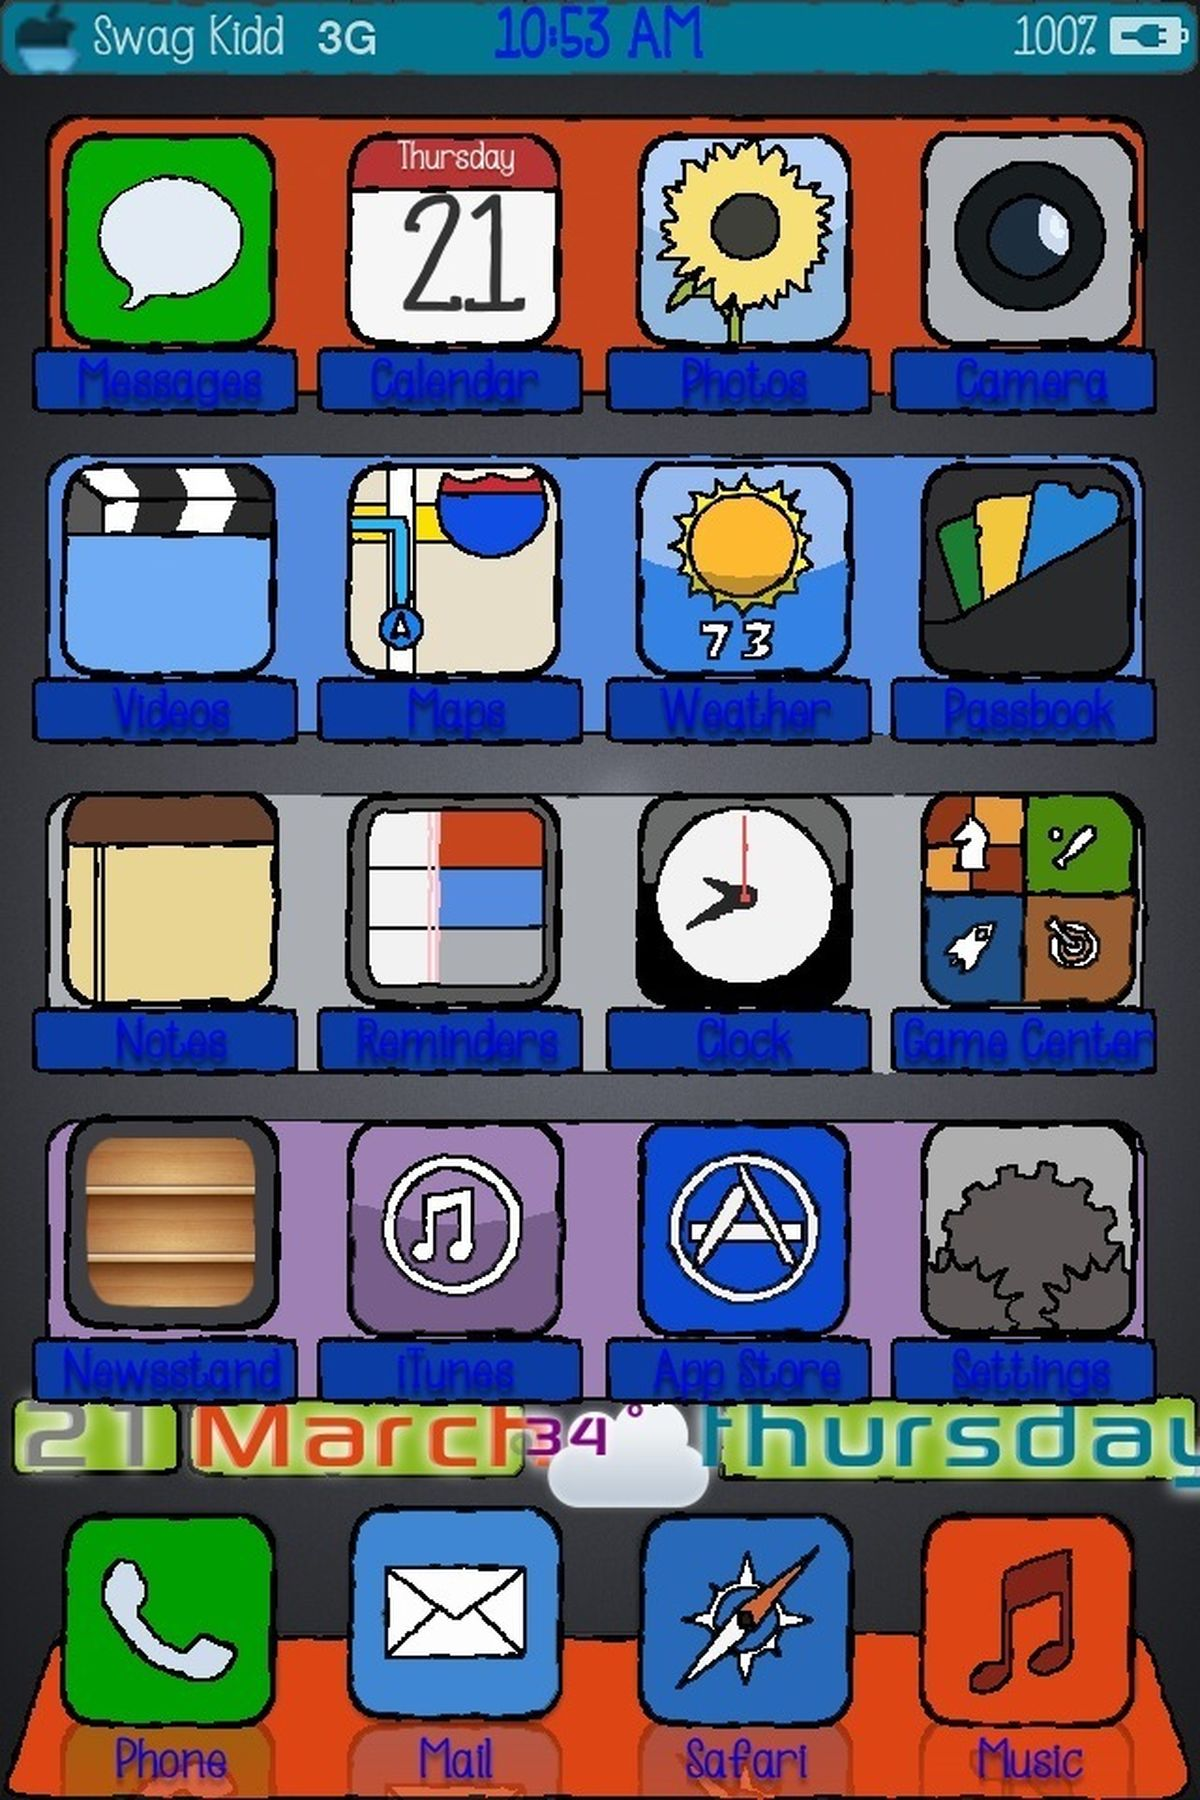 Jailbroken IPhone